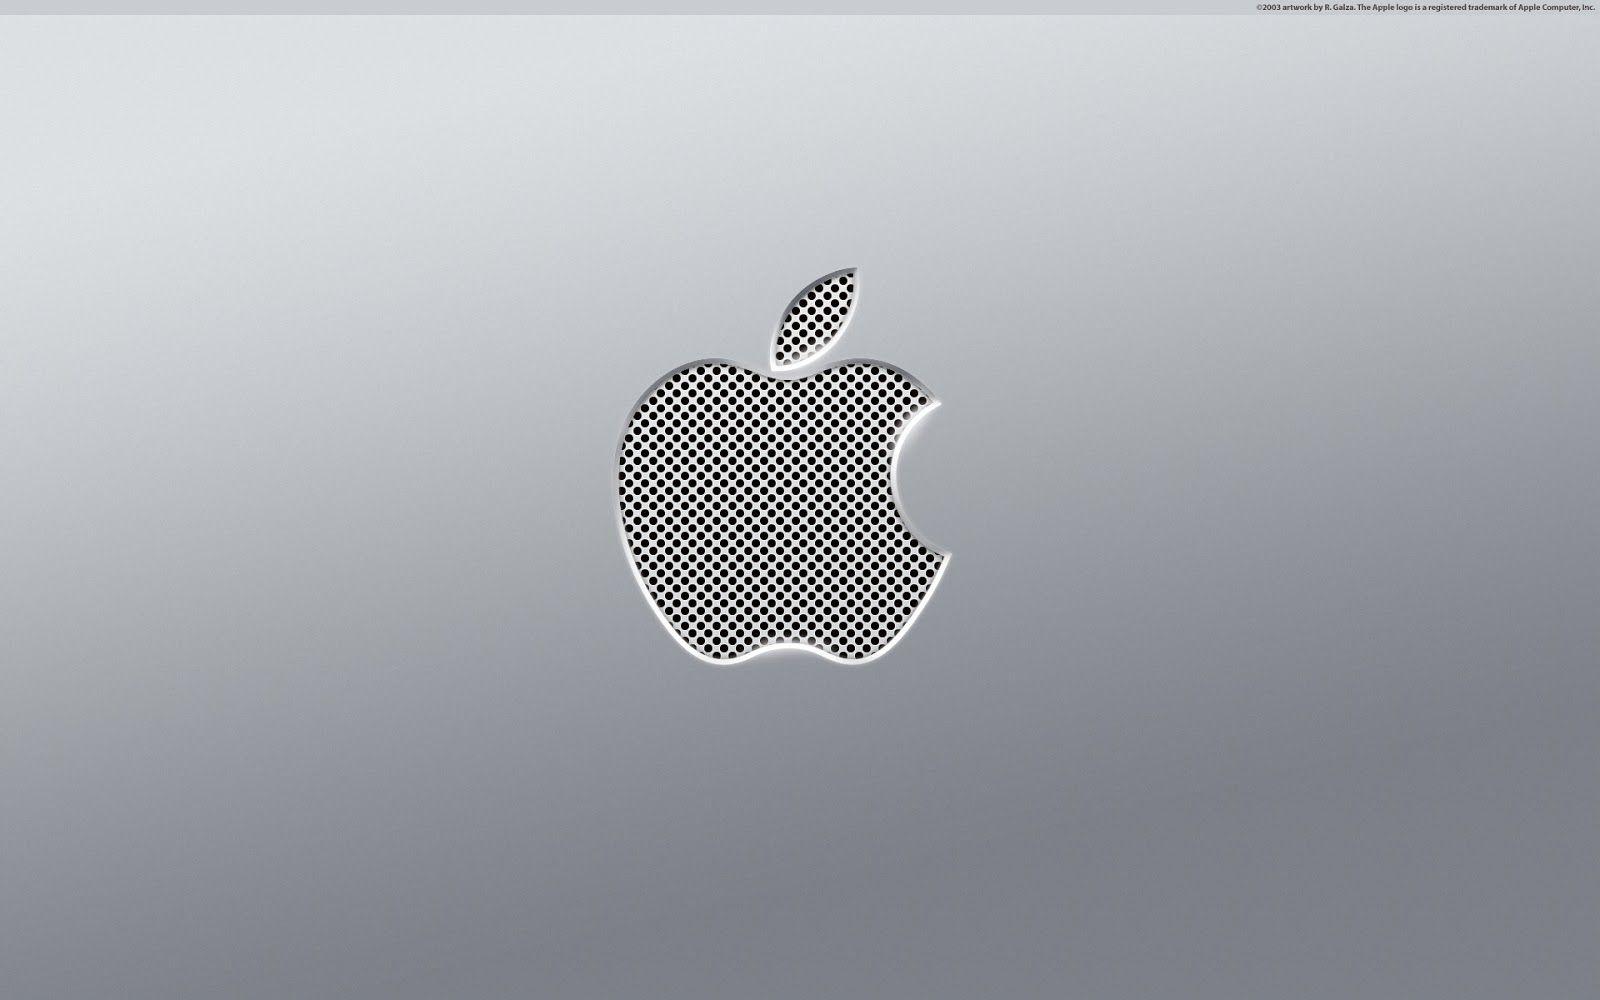 HD Wallpapers Apple Wallpaper Desktop